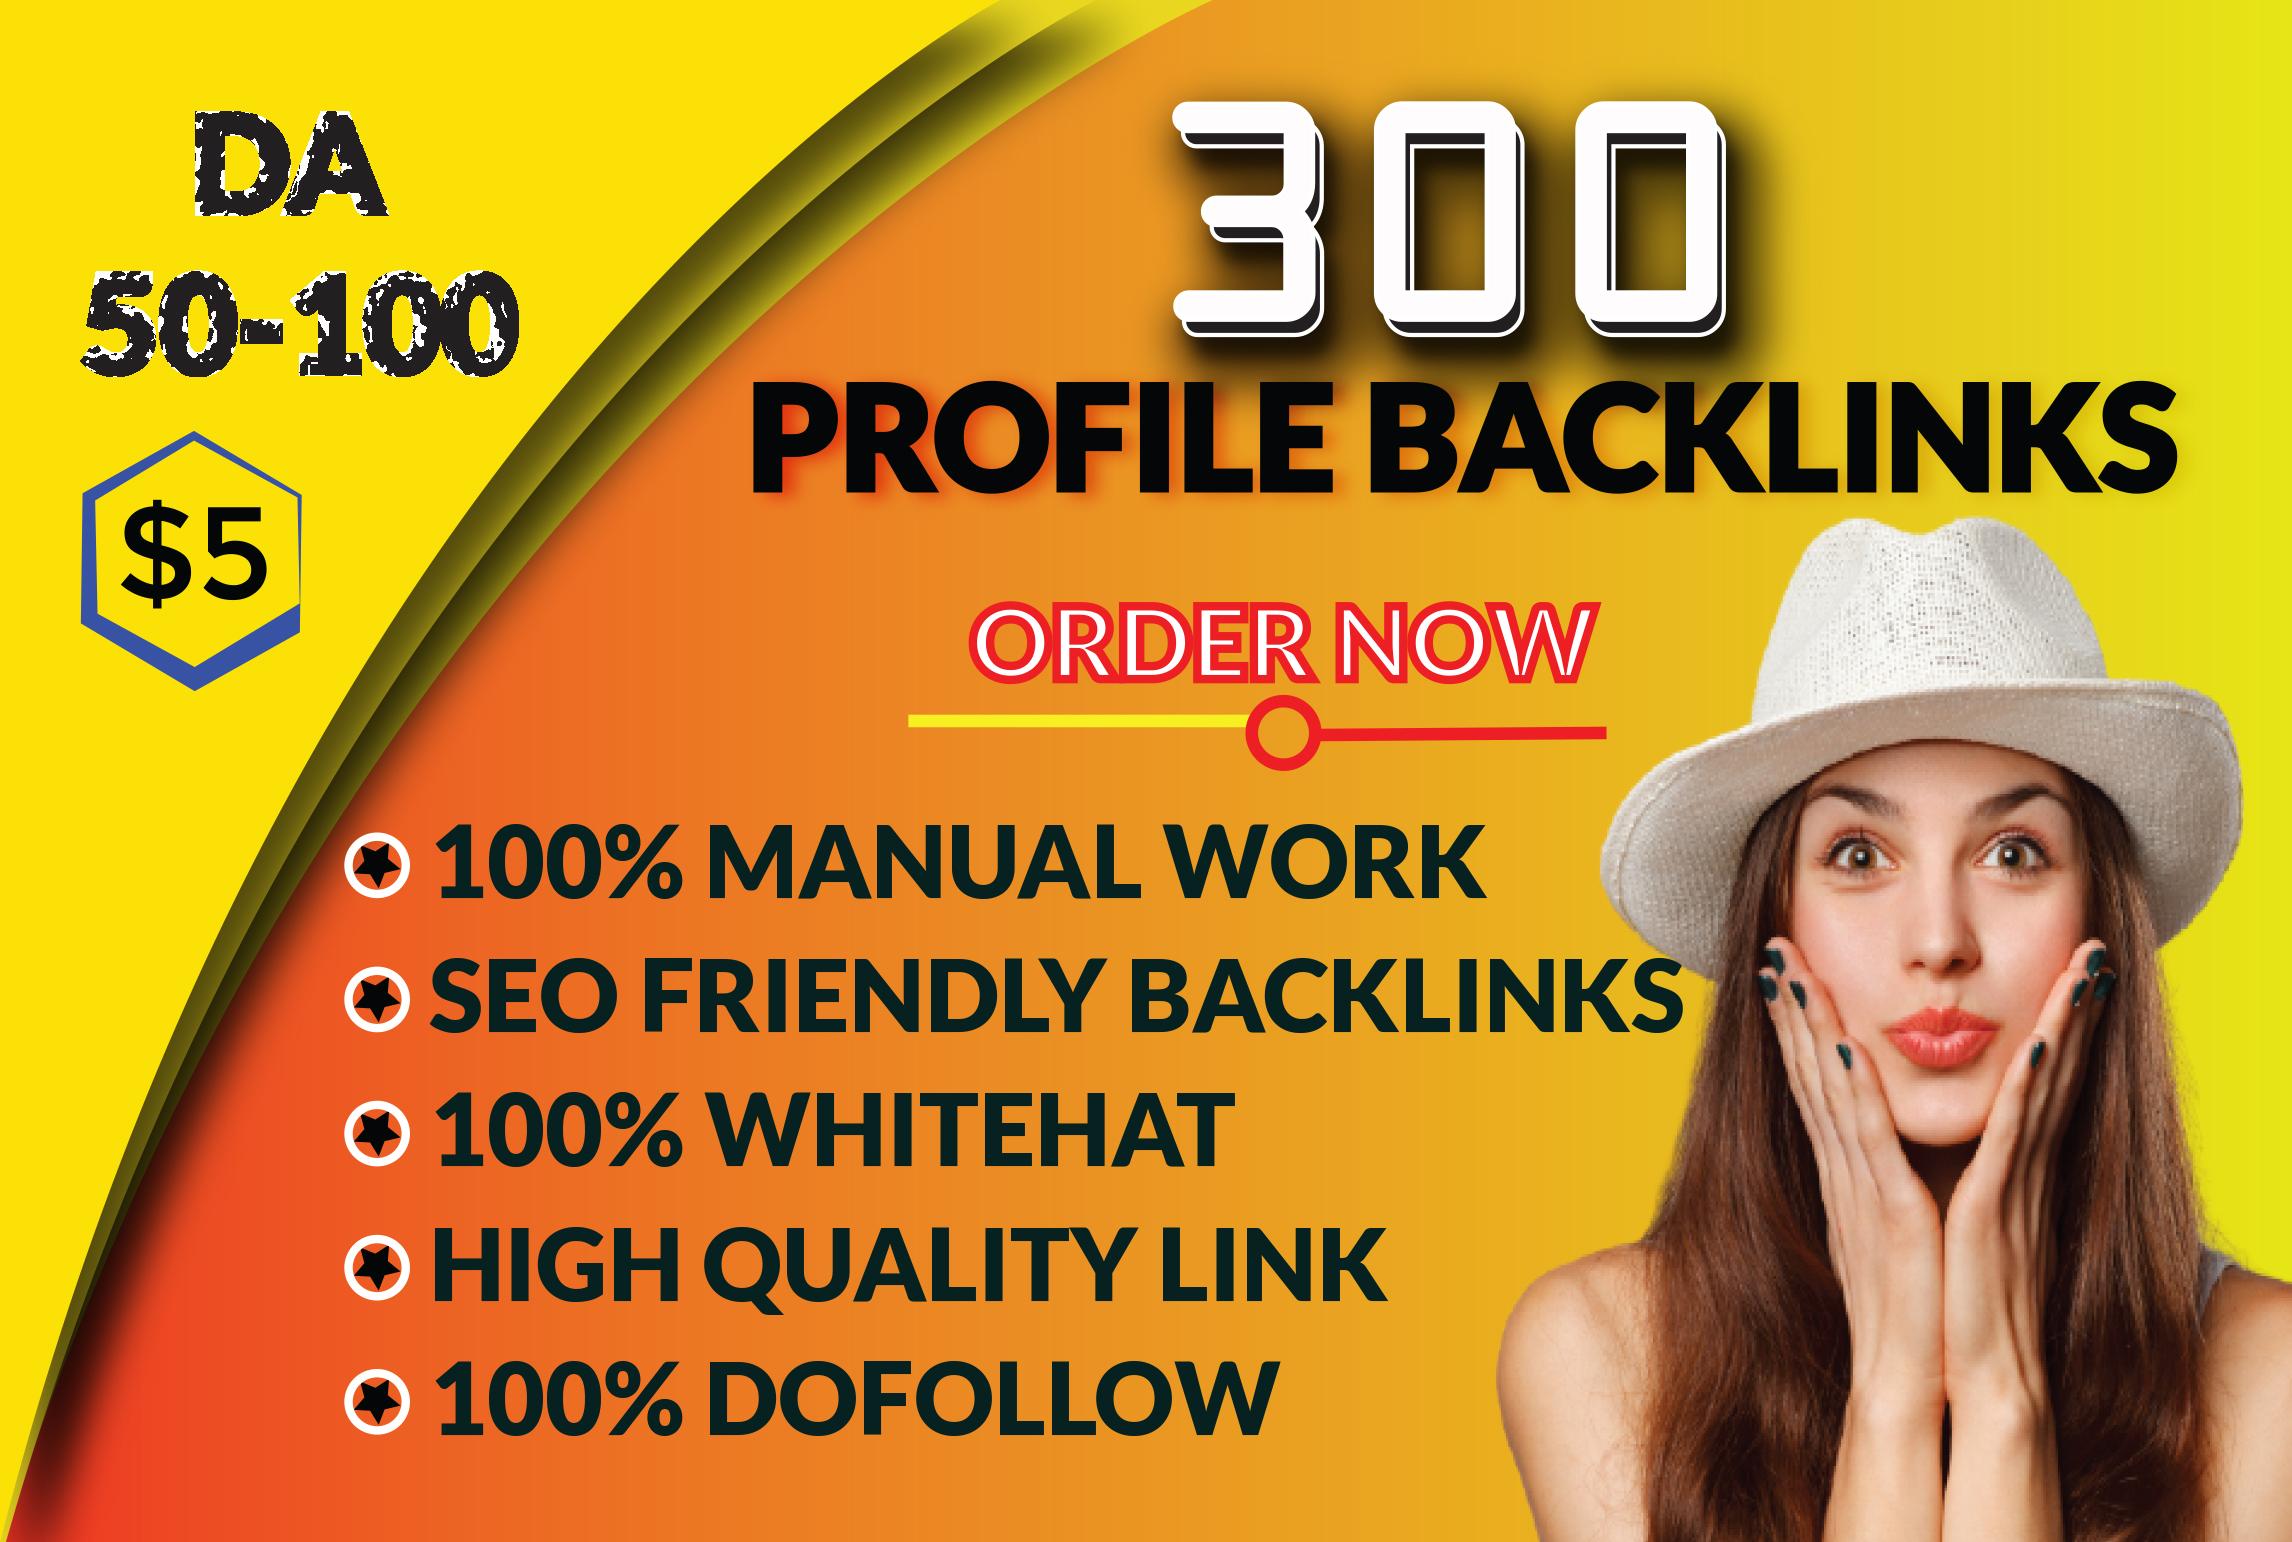 I will do 300 manual SEO Profile Backlinks